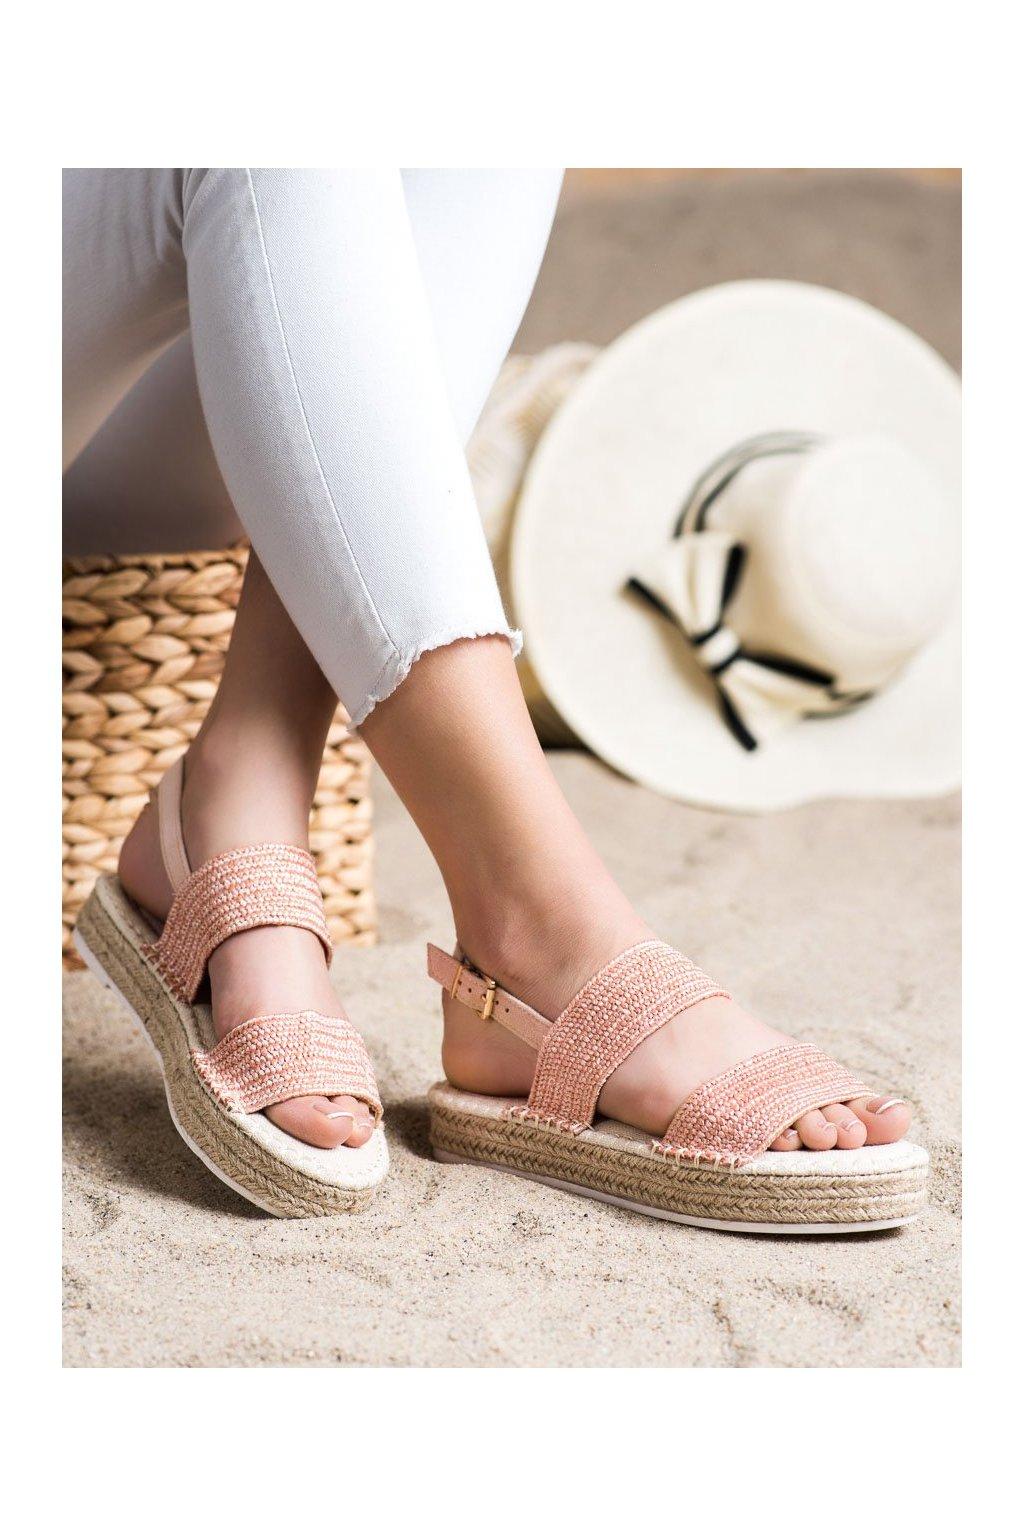 Ružové sandále Shelovet kod WSA-65P